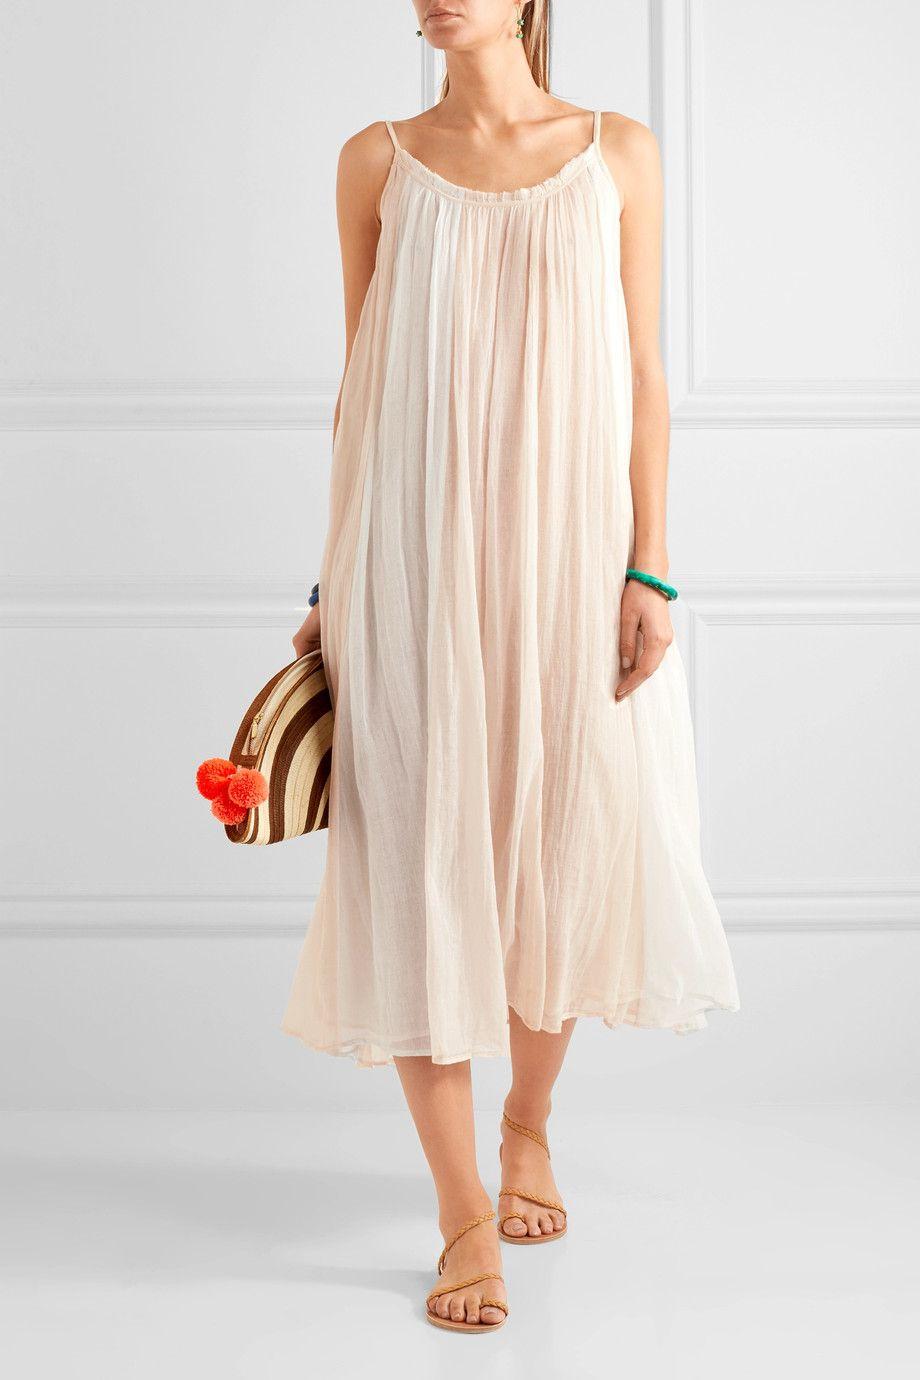 A model wearing a gauzy cotton bag